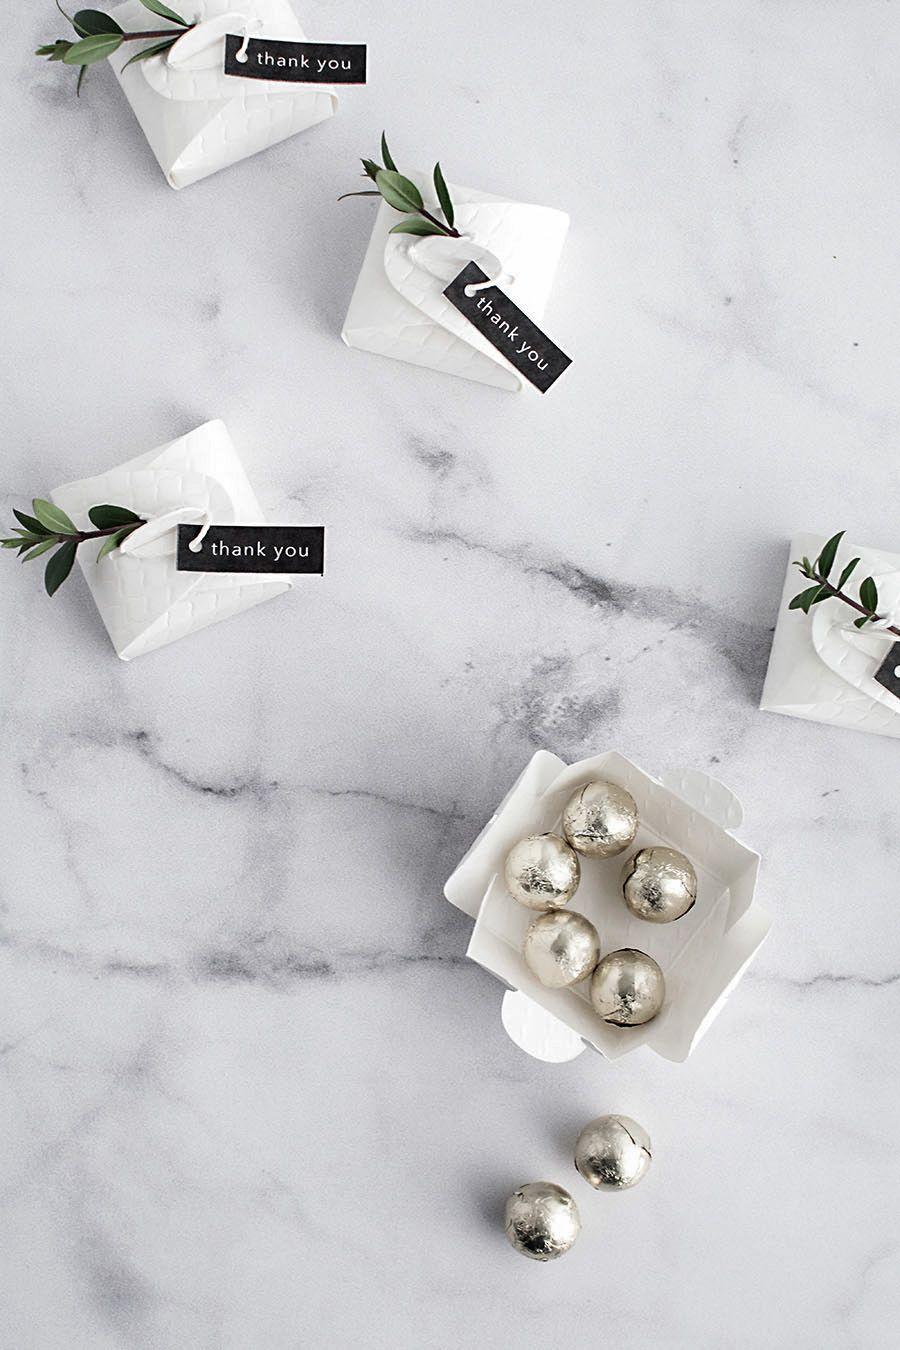 3 Simple and Modern DIY Wedding Favors - | Modern diy weddings ...